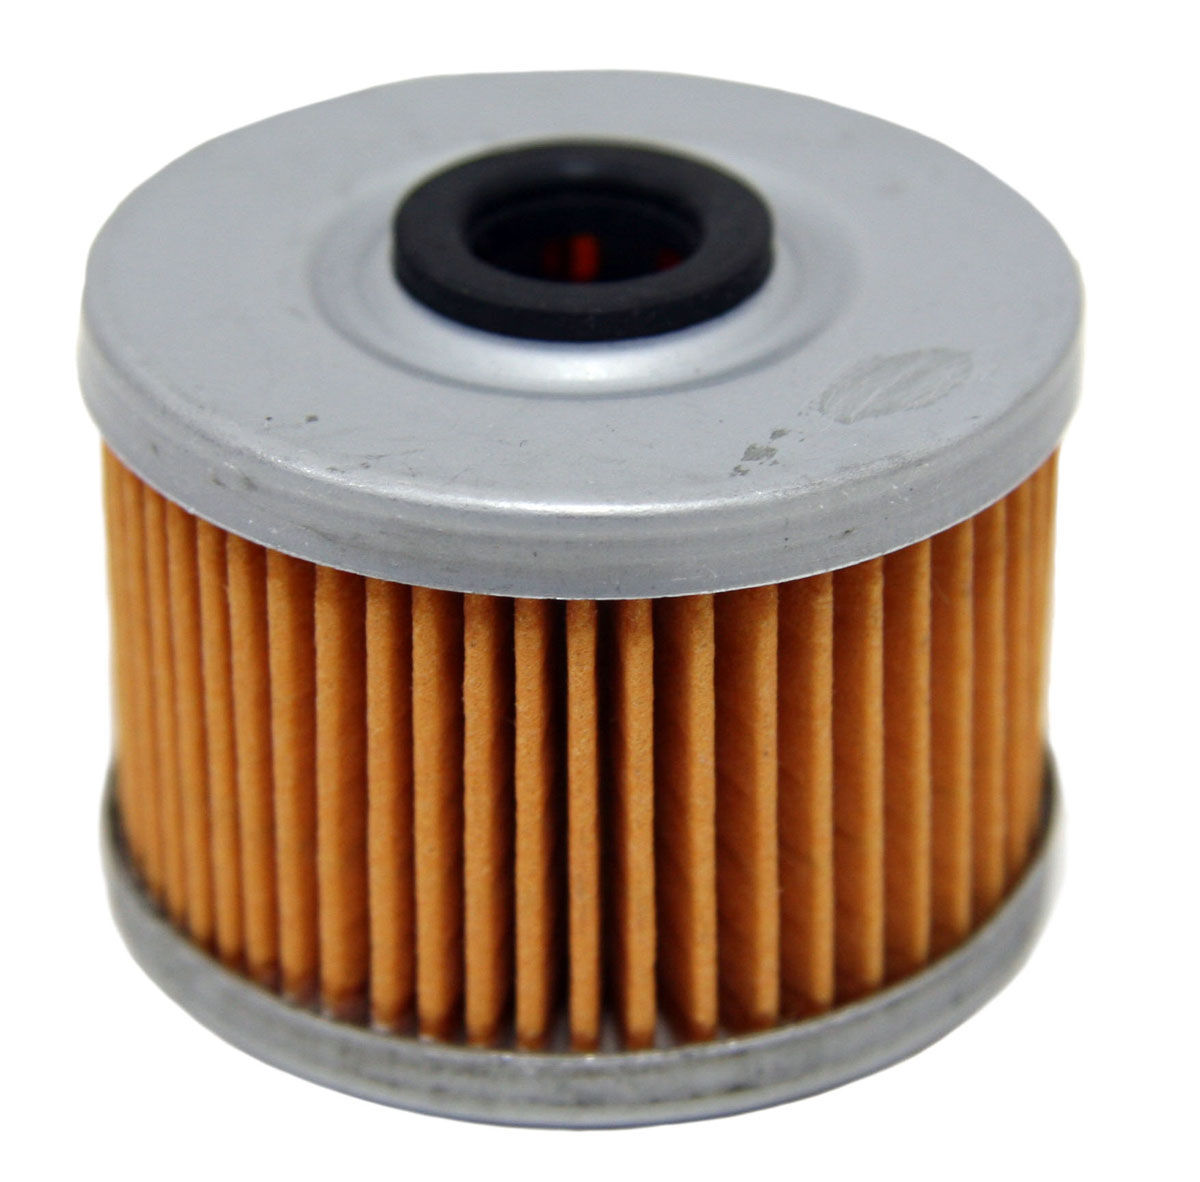 Oil Filter - Honda Rancher 350 & 420, TRX300EX TRX400EX Fourtrax 300